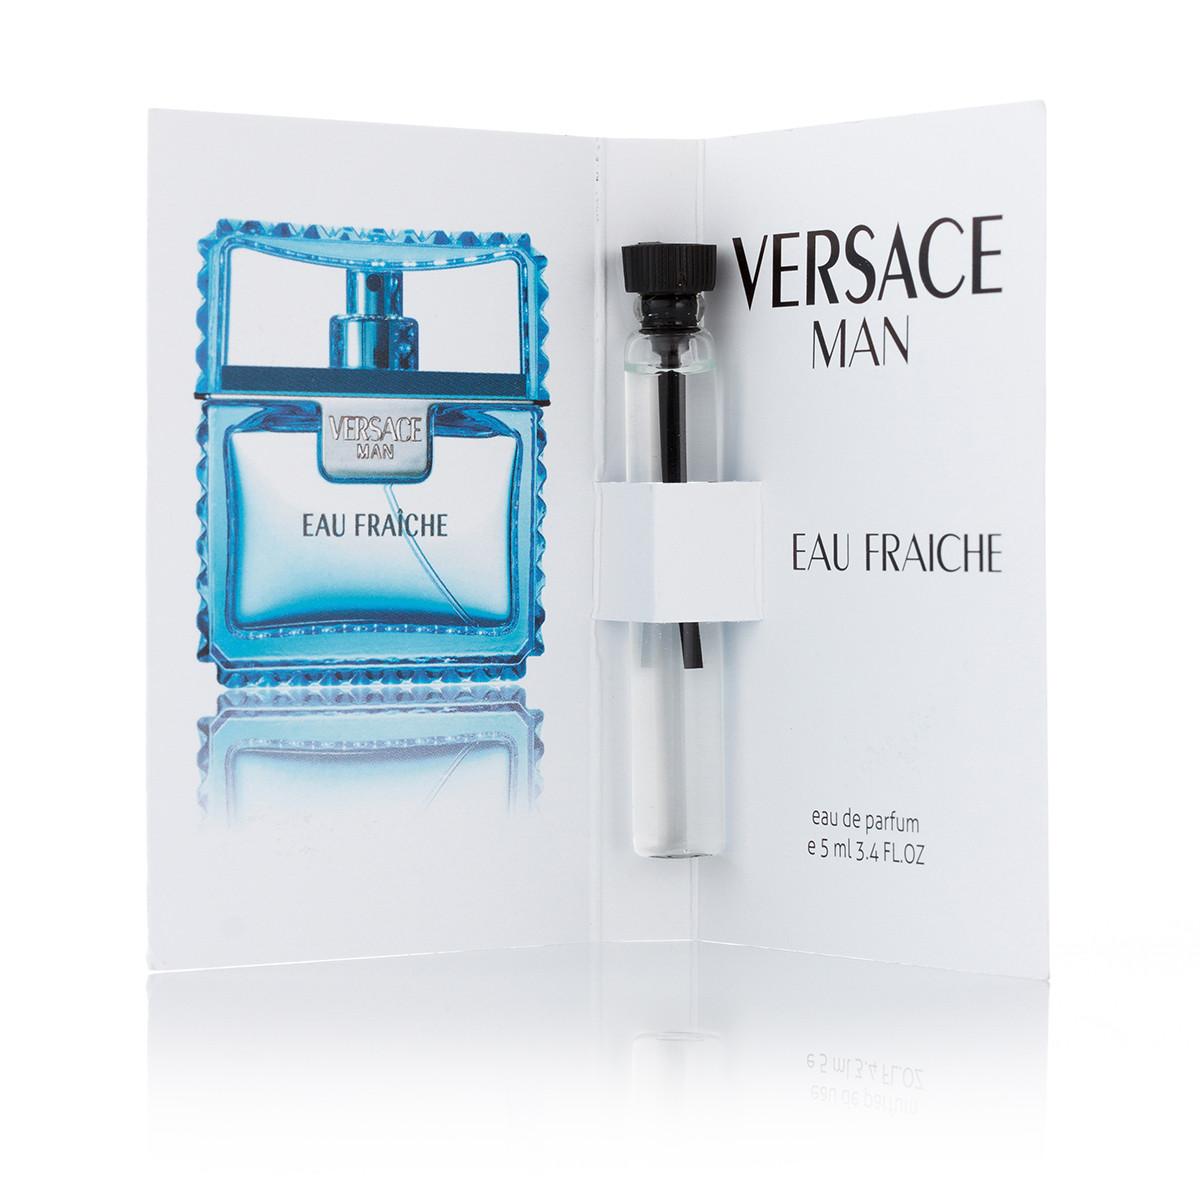 Мужская парфюмерия Versace Man Eau Fraiche пробник 5 ml (реплика)